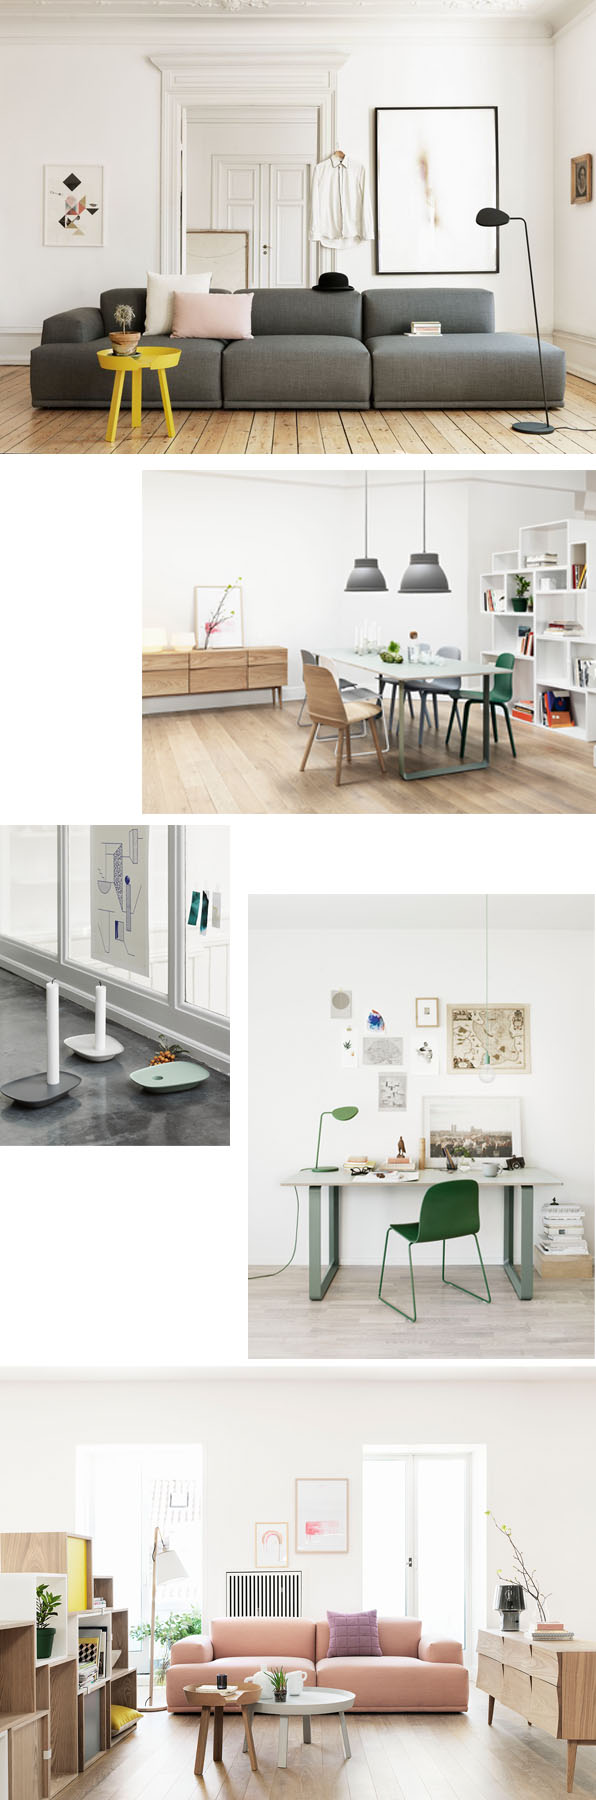 02 diseño nordico nordicdesign de © MUUTO en modus-vivendi